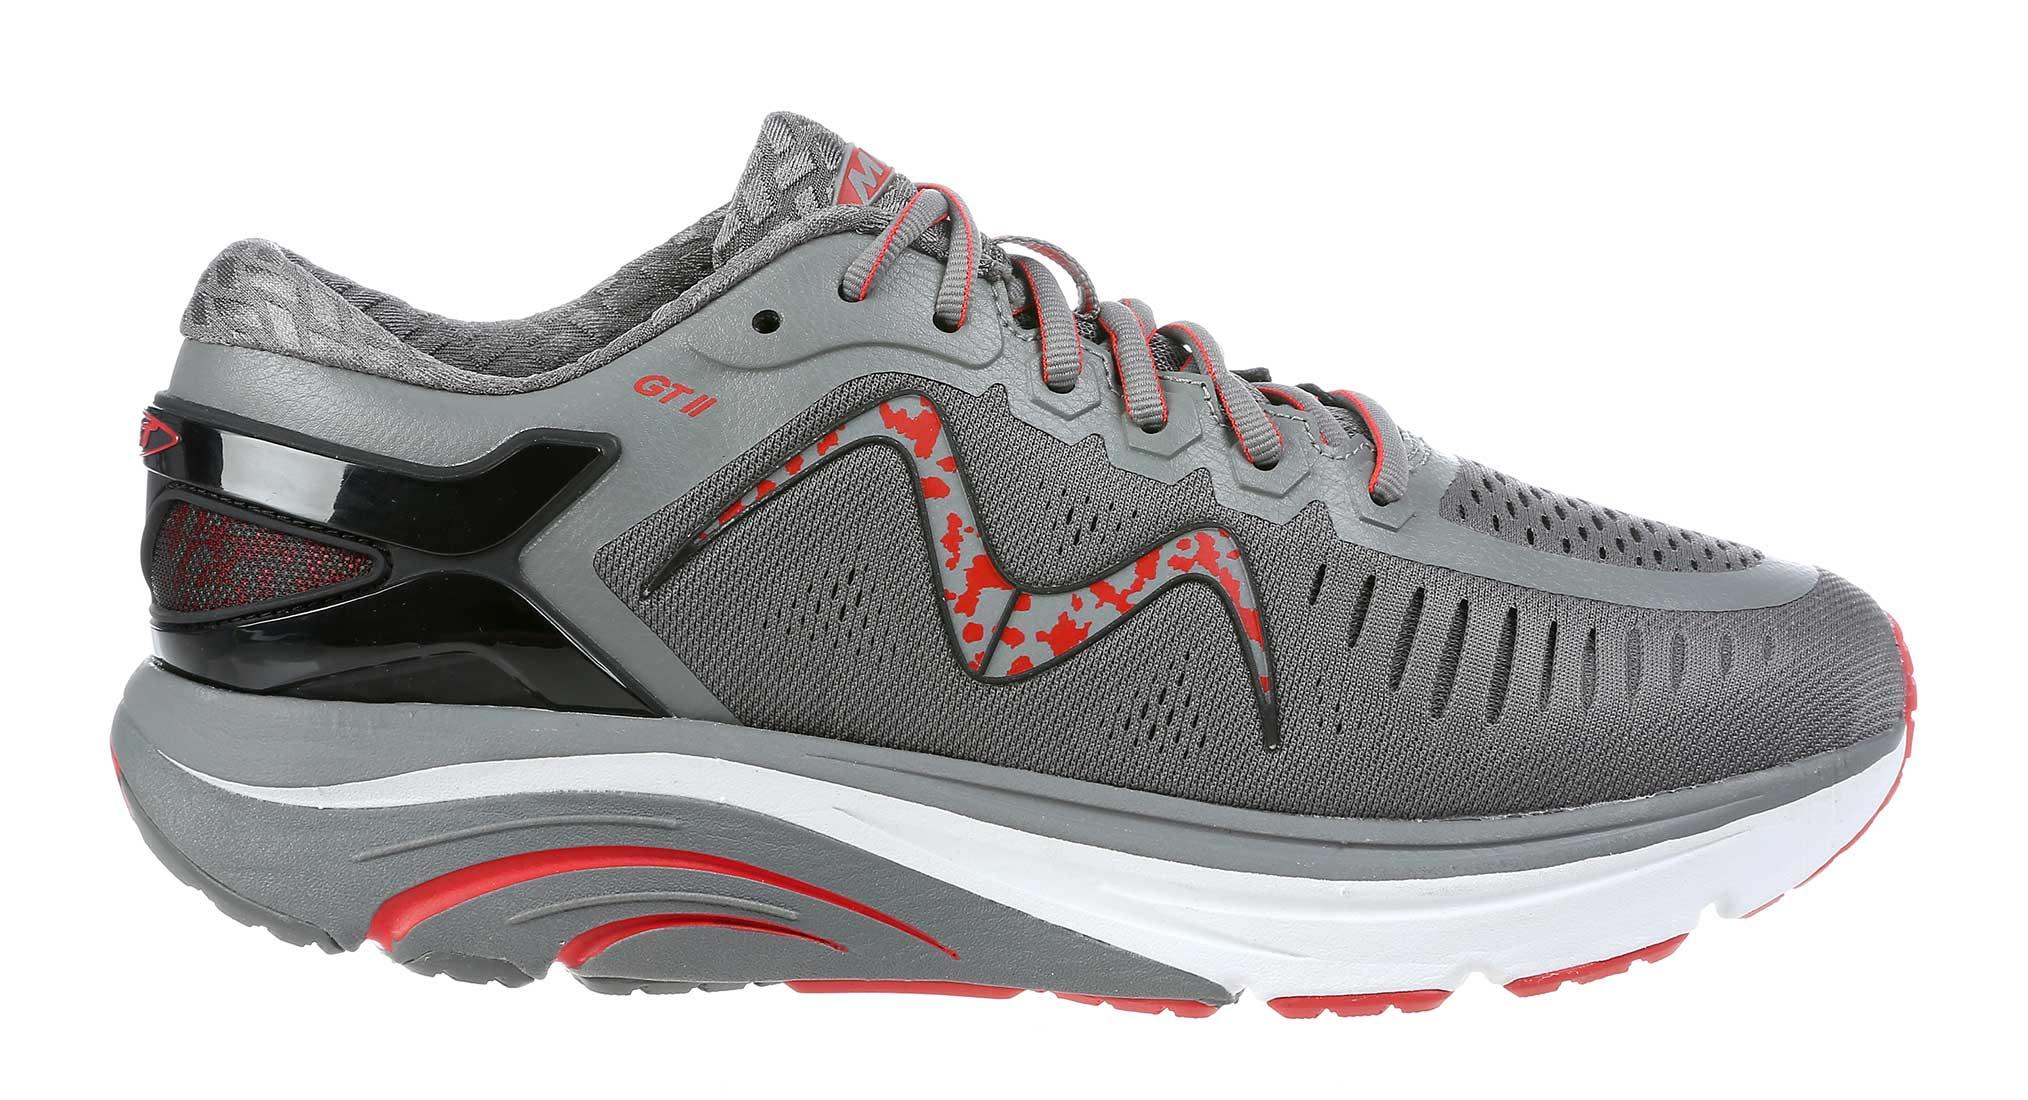 MBT Shoes Men's GT 2 Running Shoes 702023 Men's Comfort Therapeutic Rocker Bottom Shoe Medium